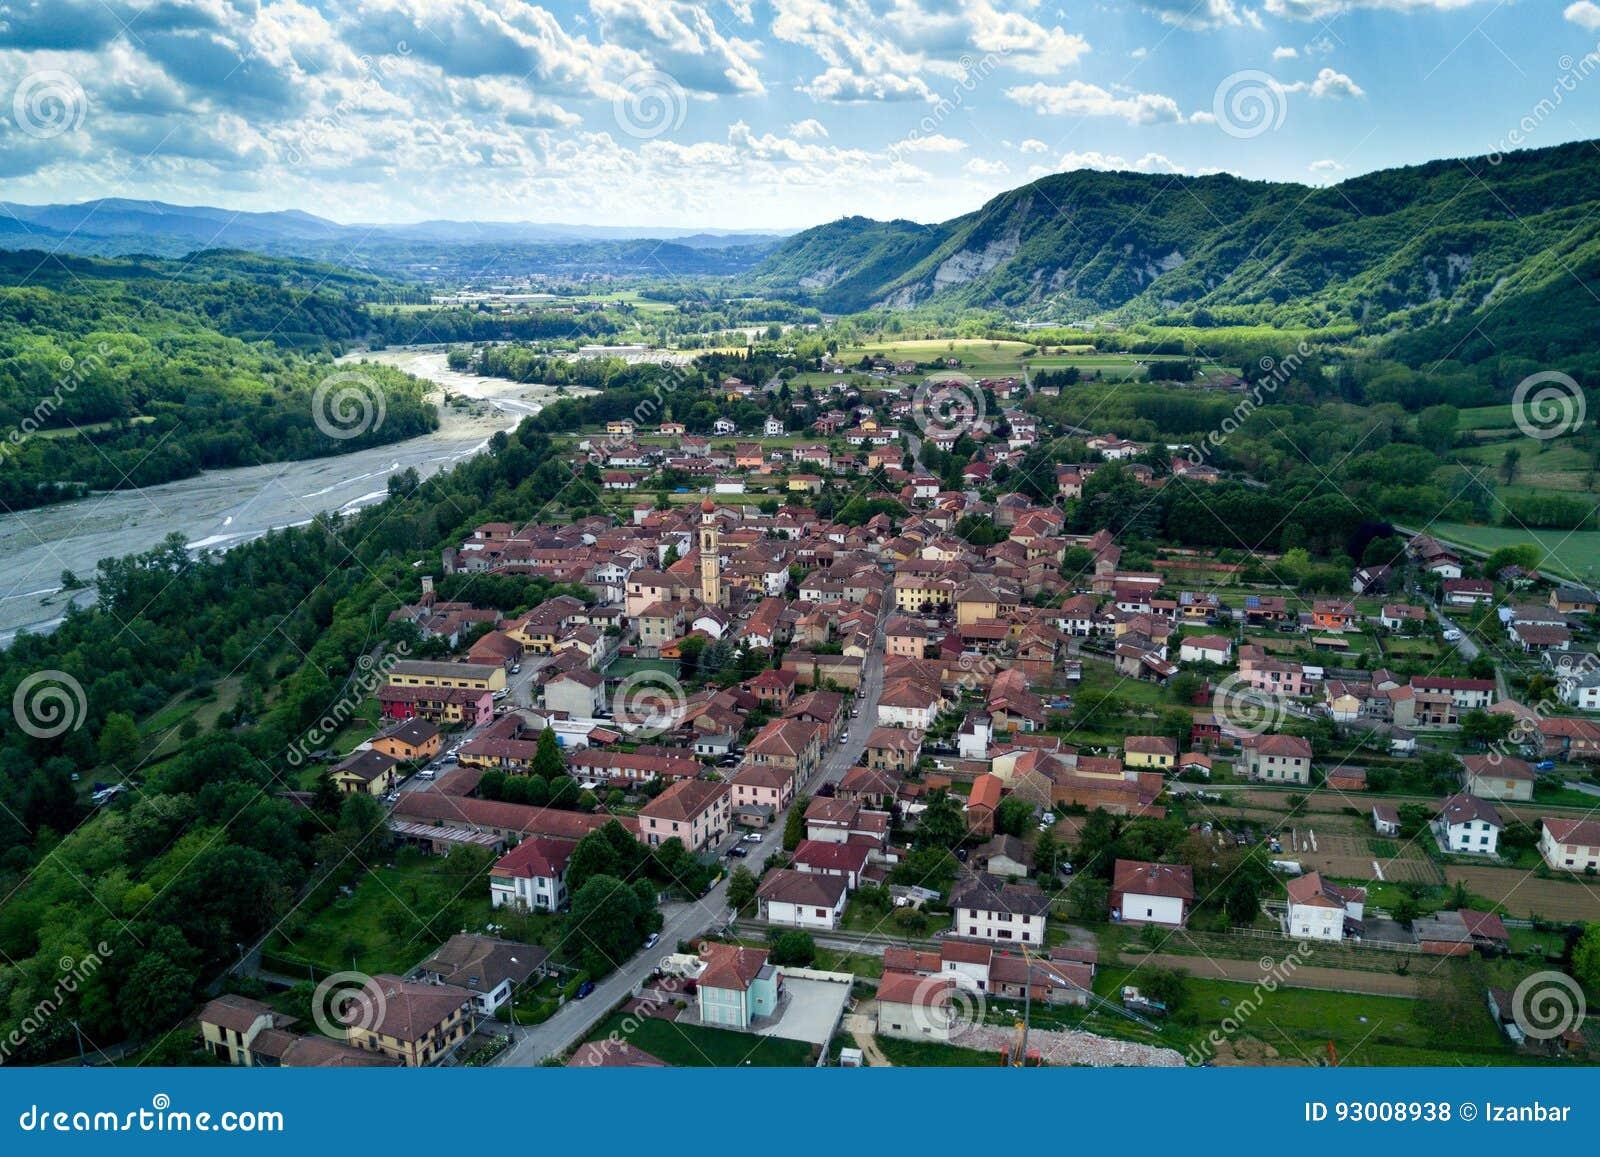 Borghetto di borbera italian countryside village aerial view stock royalty free stock photo sciox Image collections